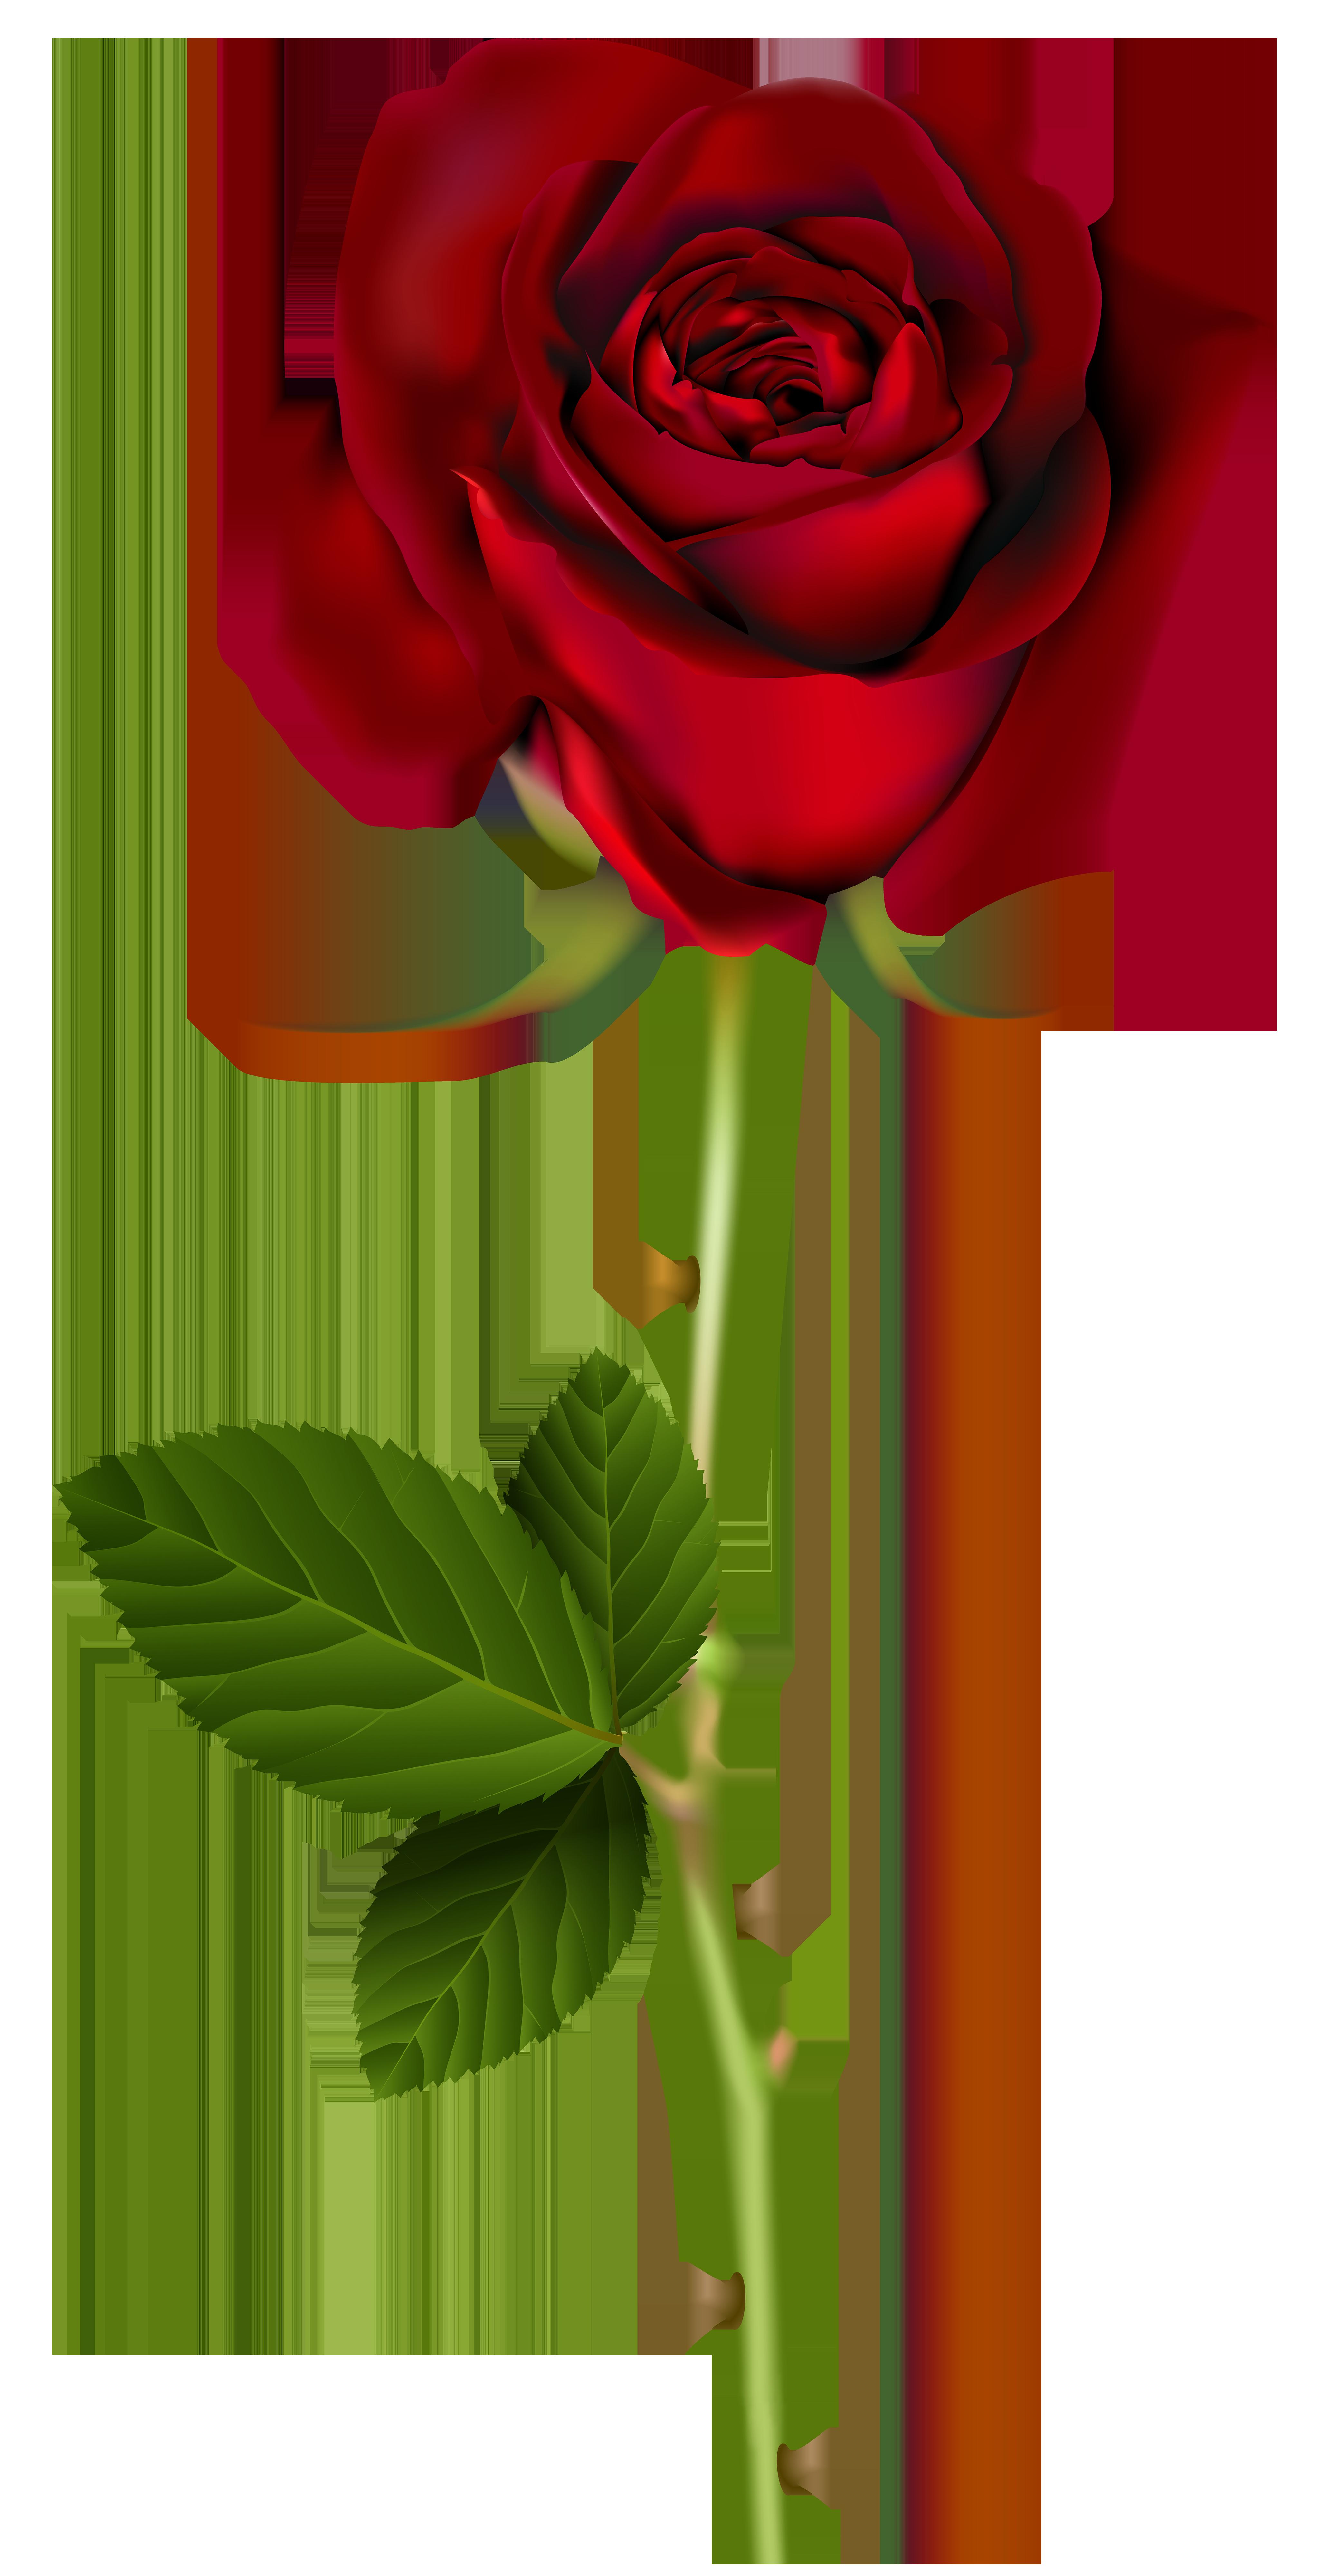 Red Rose PNG Transparent Image | Red rose png, Rose flower png, Rose clipart